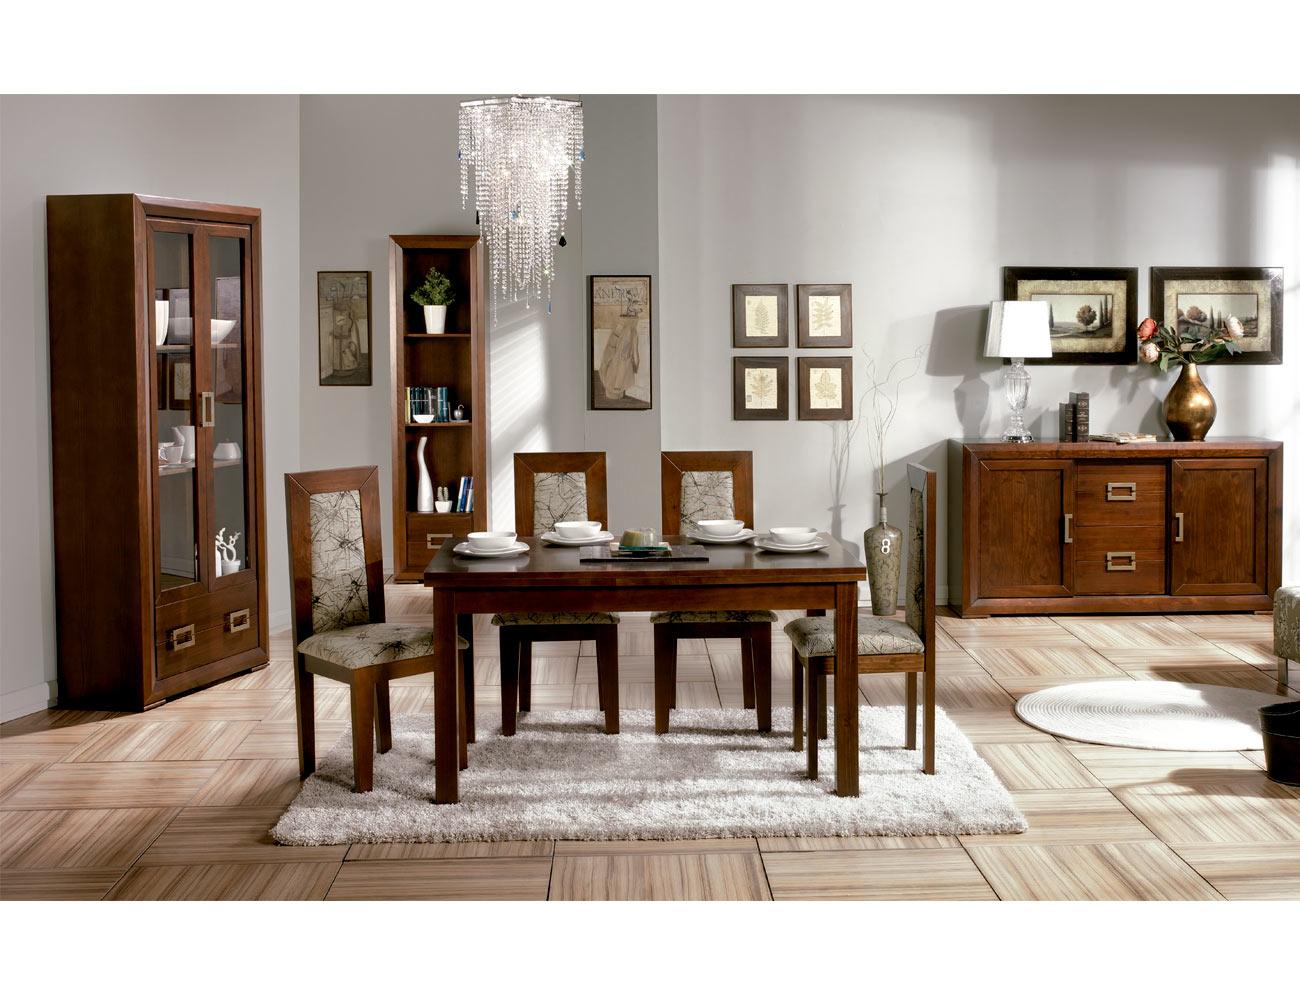 Composicion34 mueble salon comedor madera2